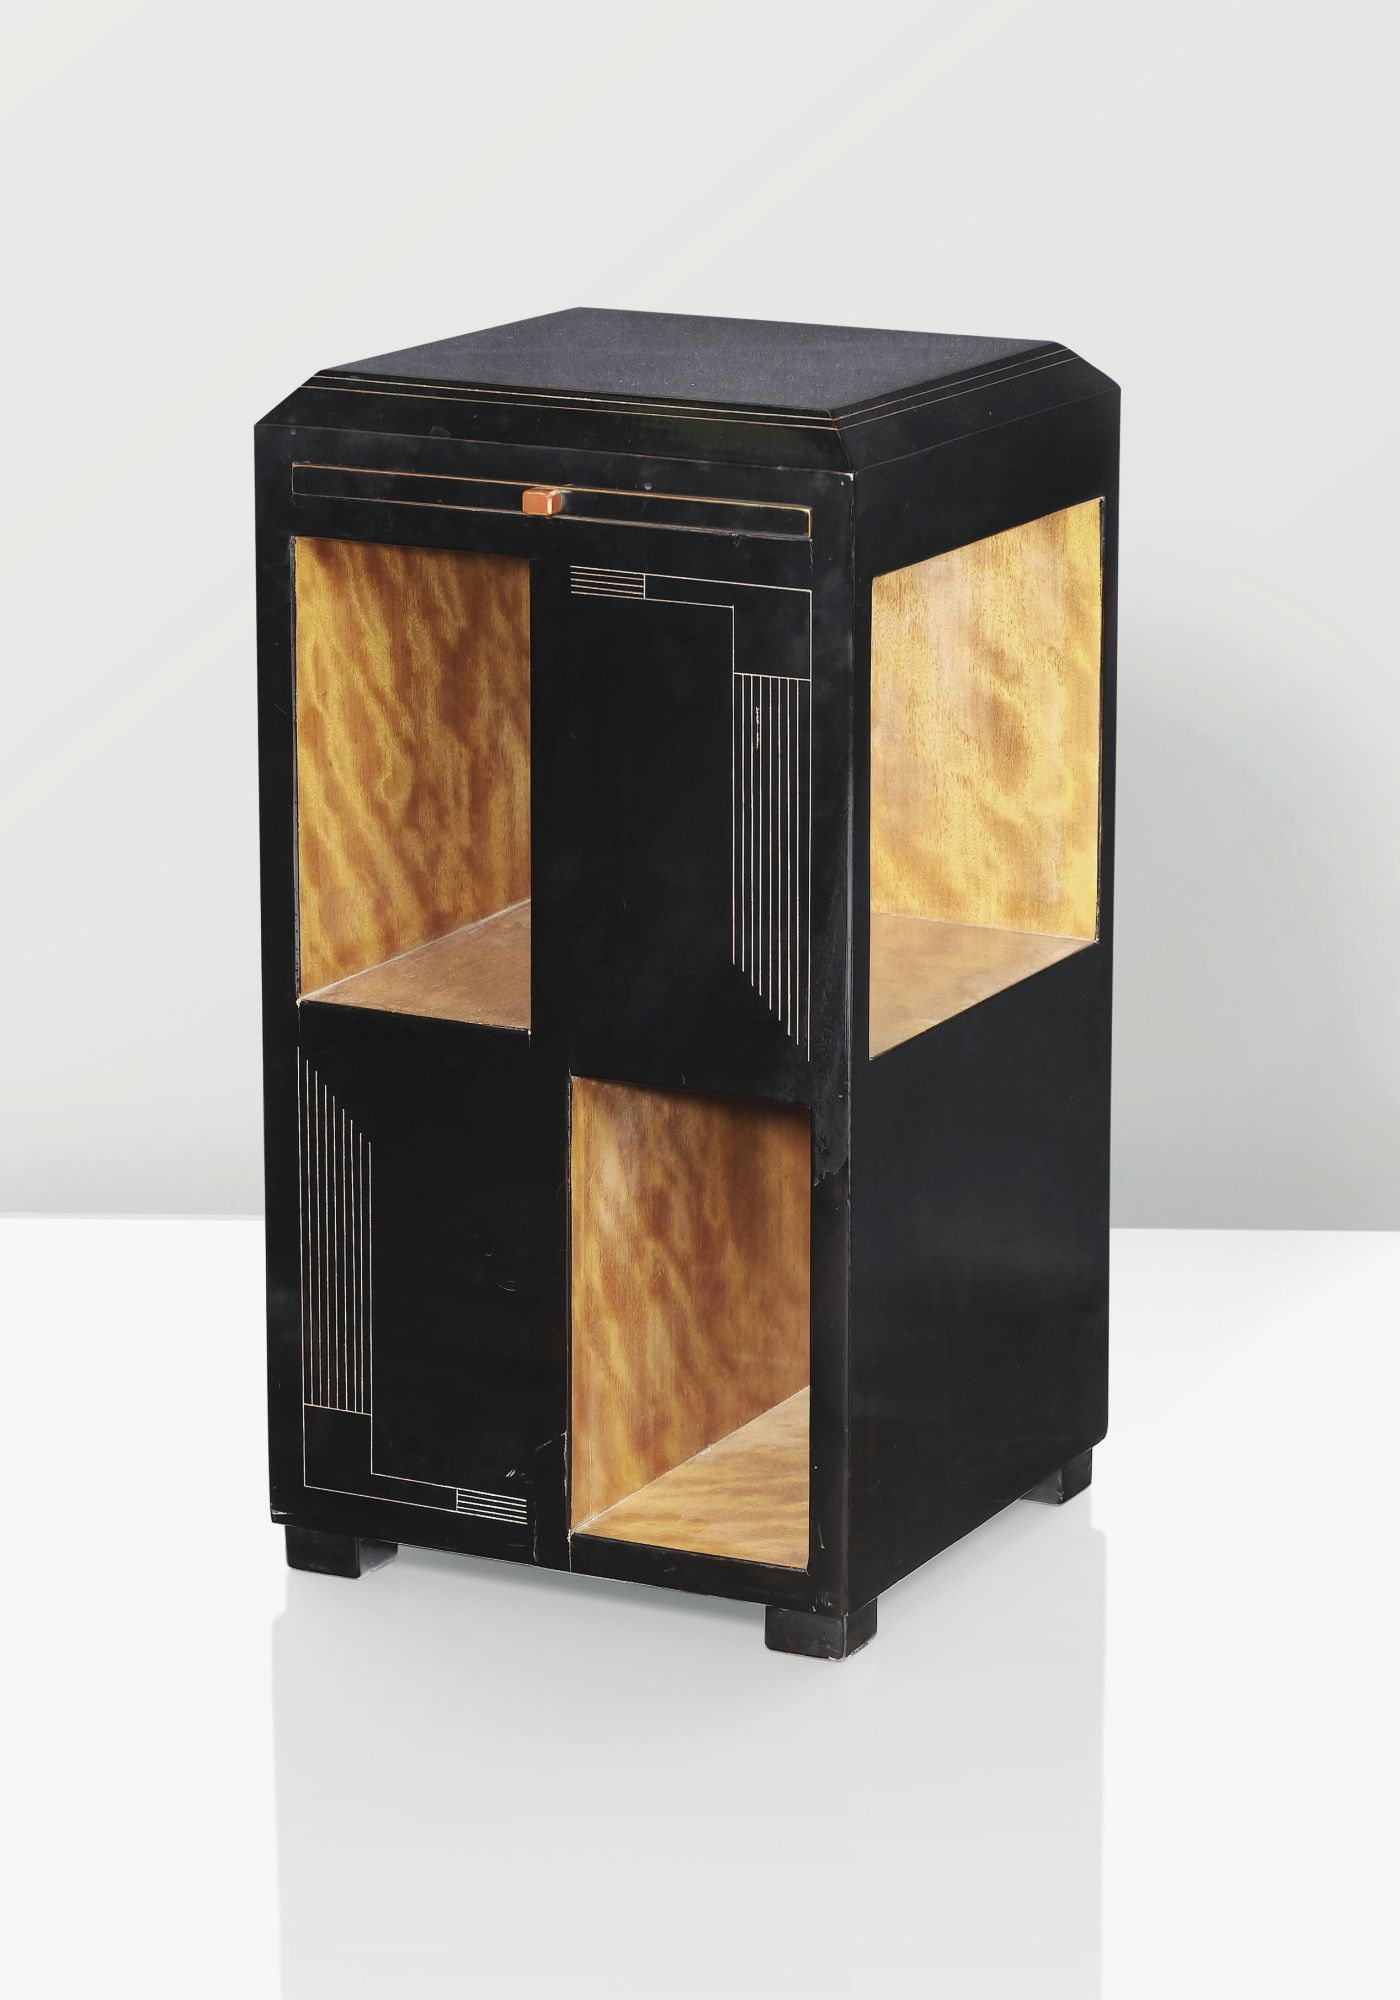 Dunand Rovinski Petite Bibli Furniture Art Deco Art Deco Furniture Art Deco Design